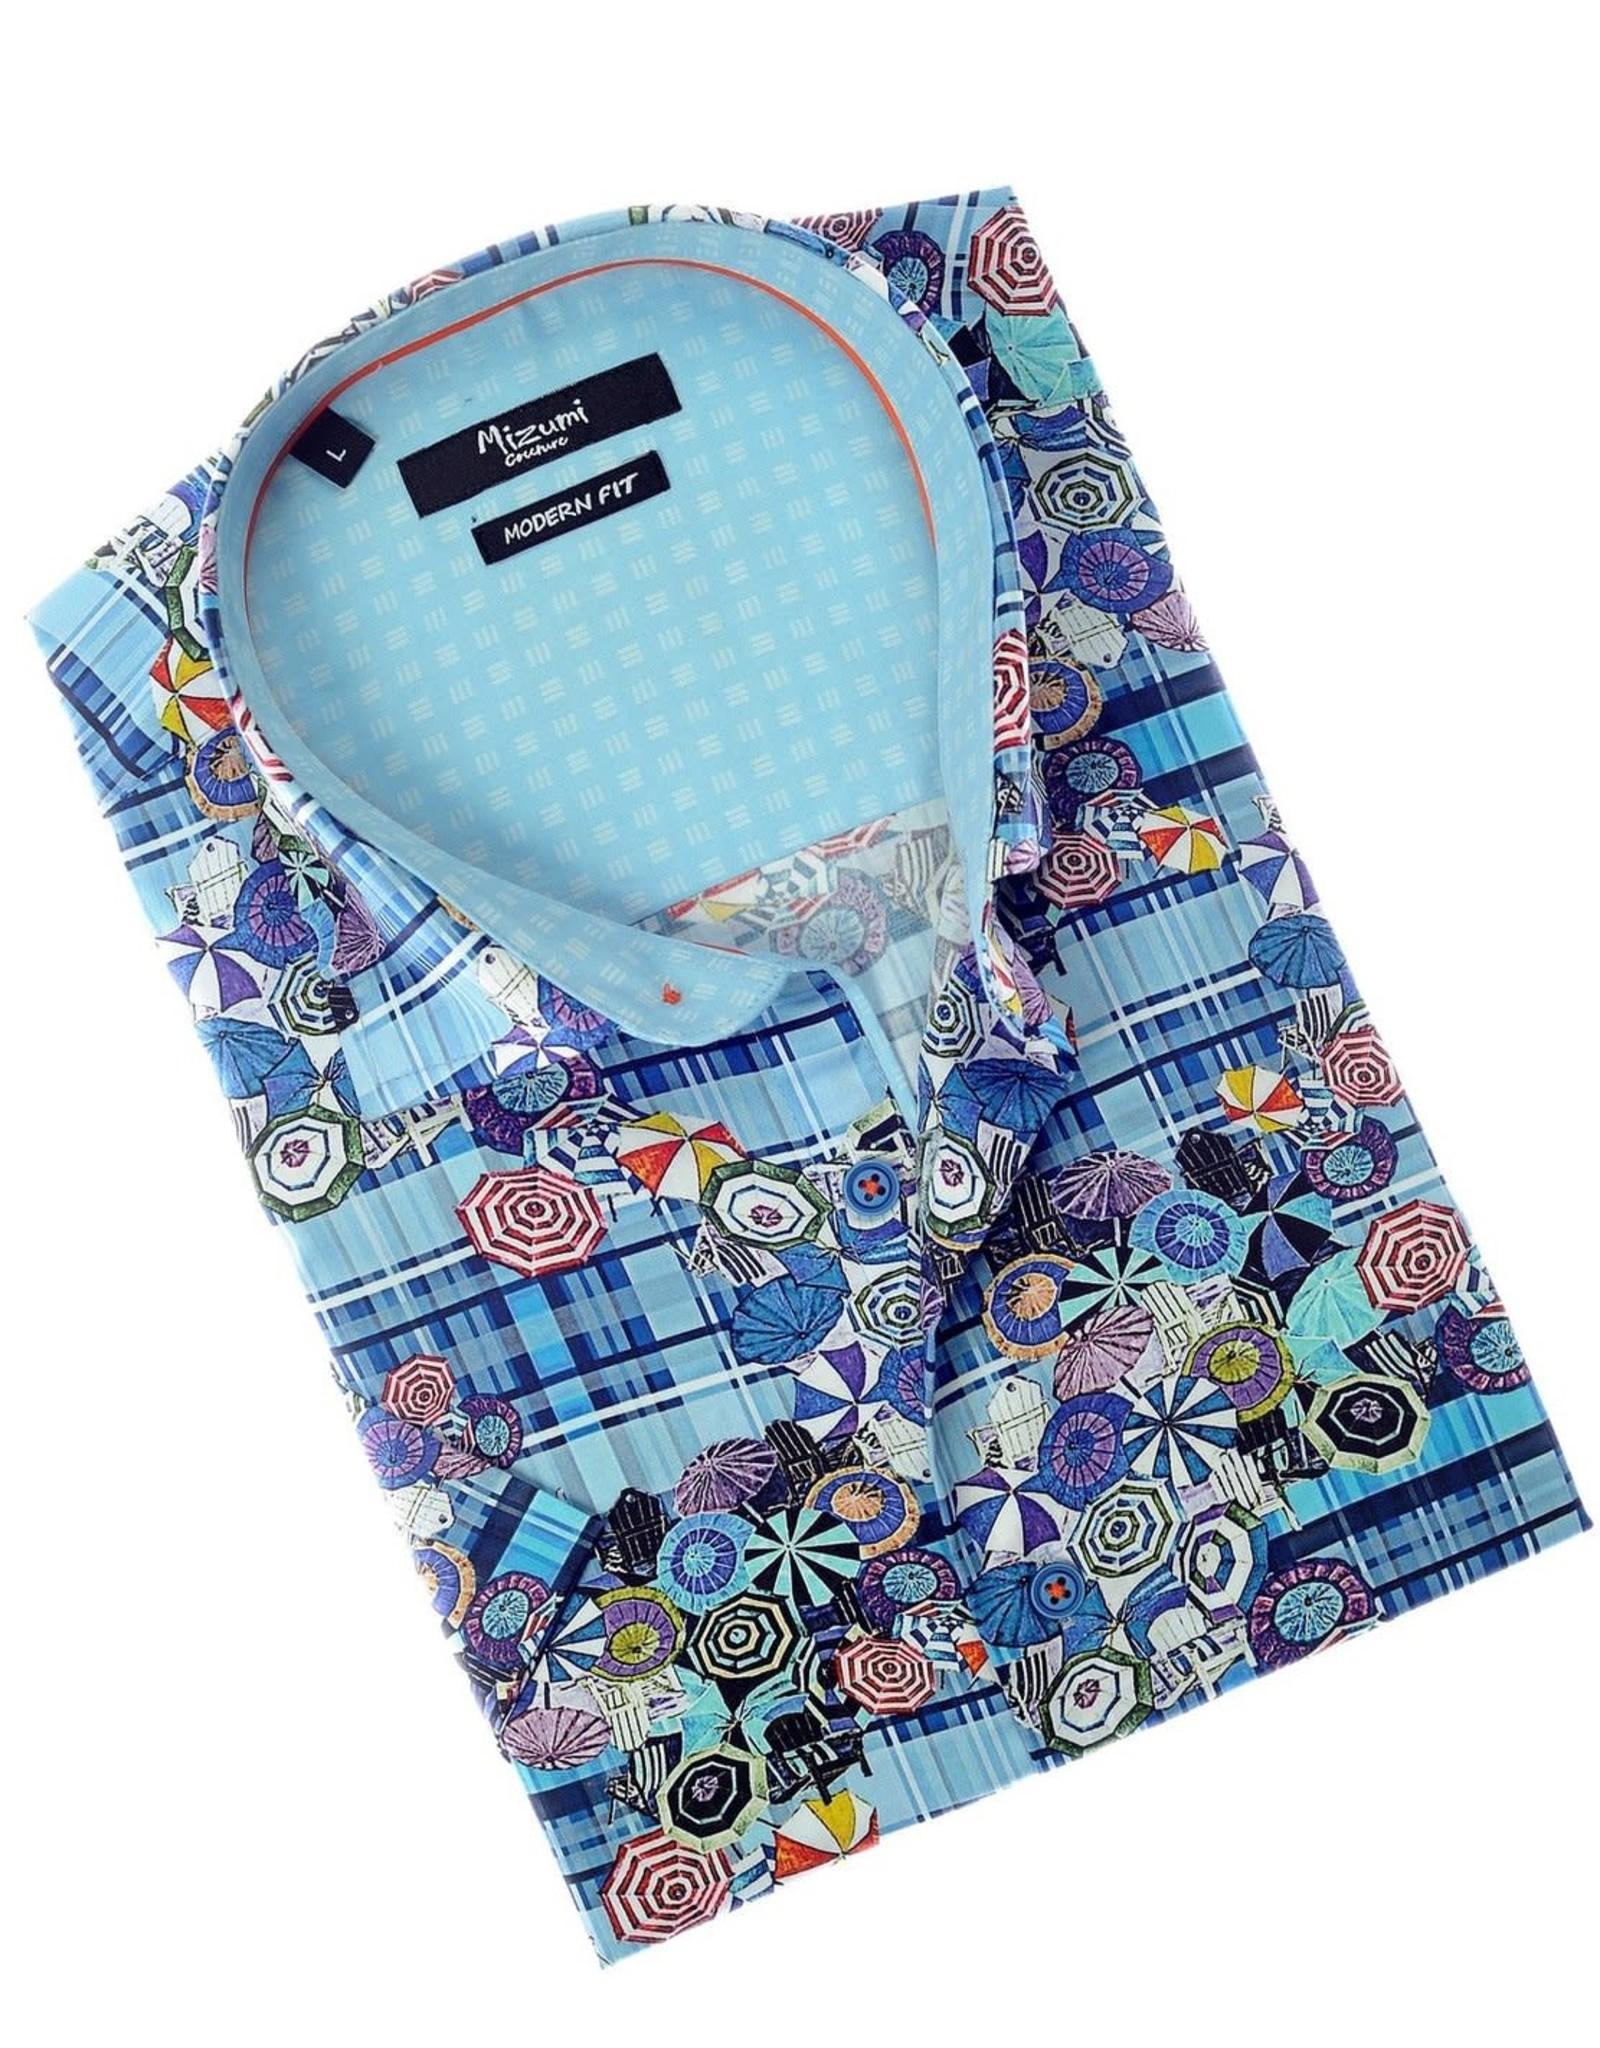 Mizumi Umbrella Print Shirt